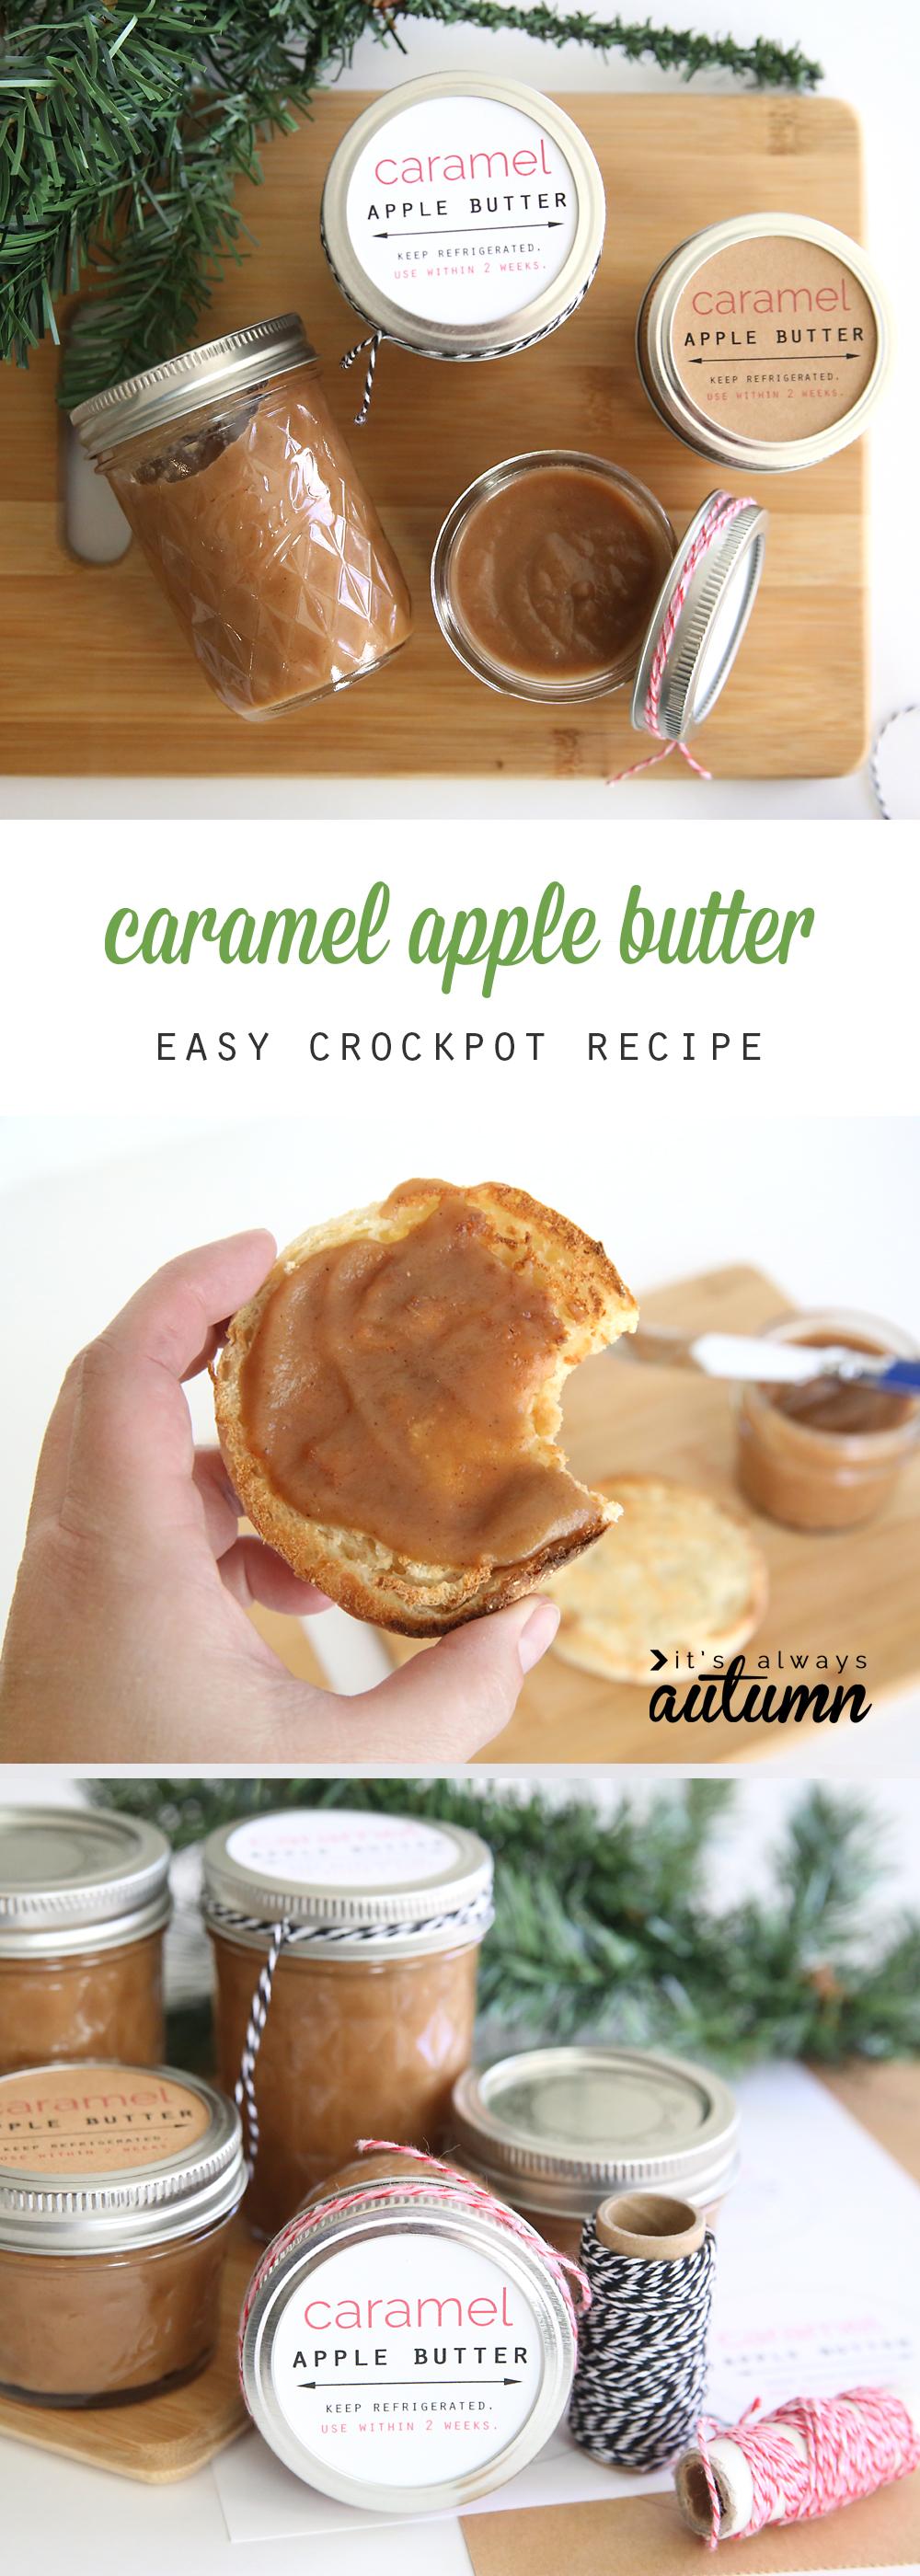 Crockpot Caramel Apple Butter Diy Gift Idea It S Always Autumn